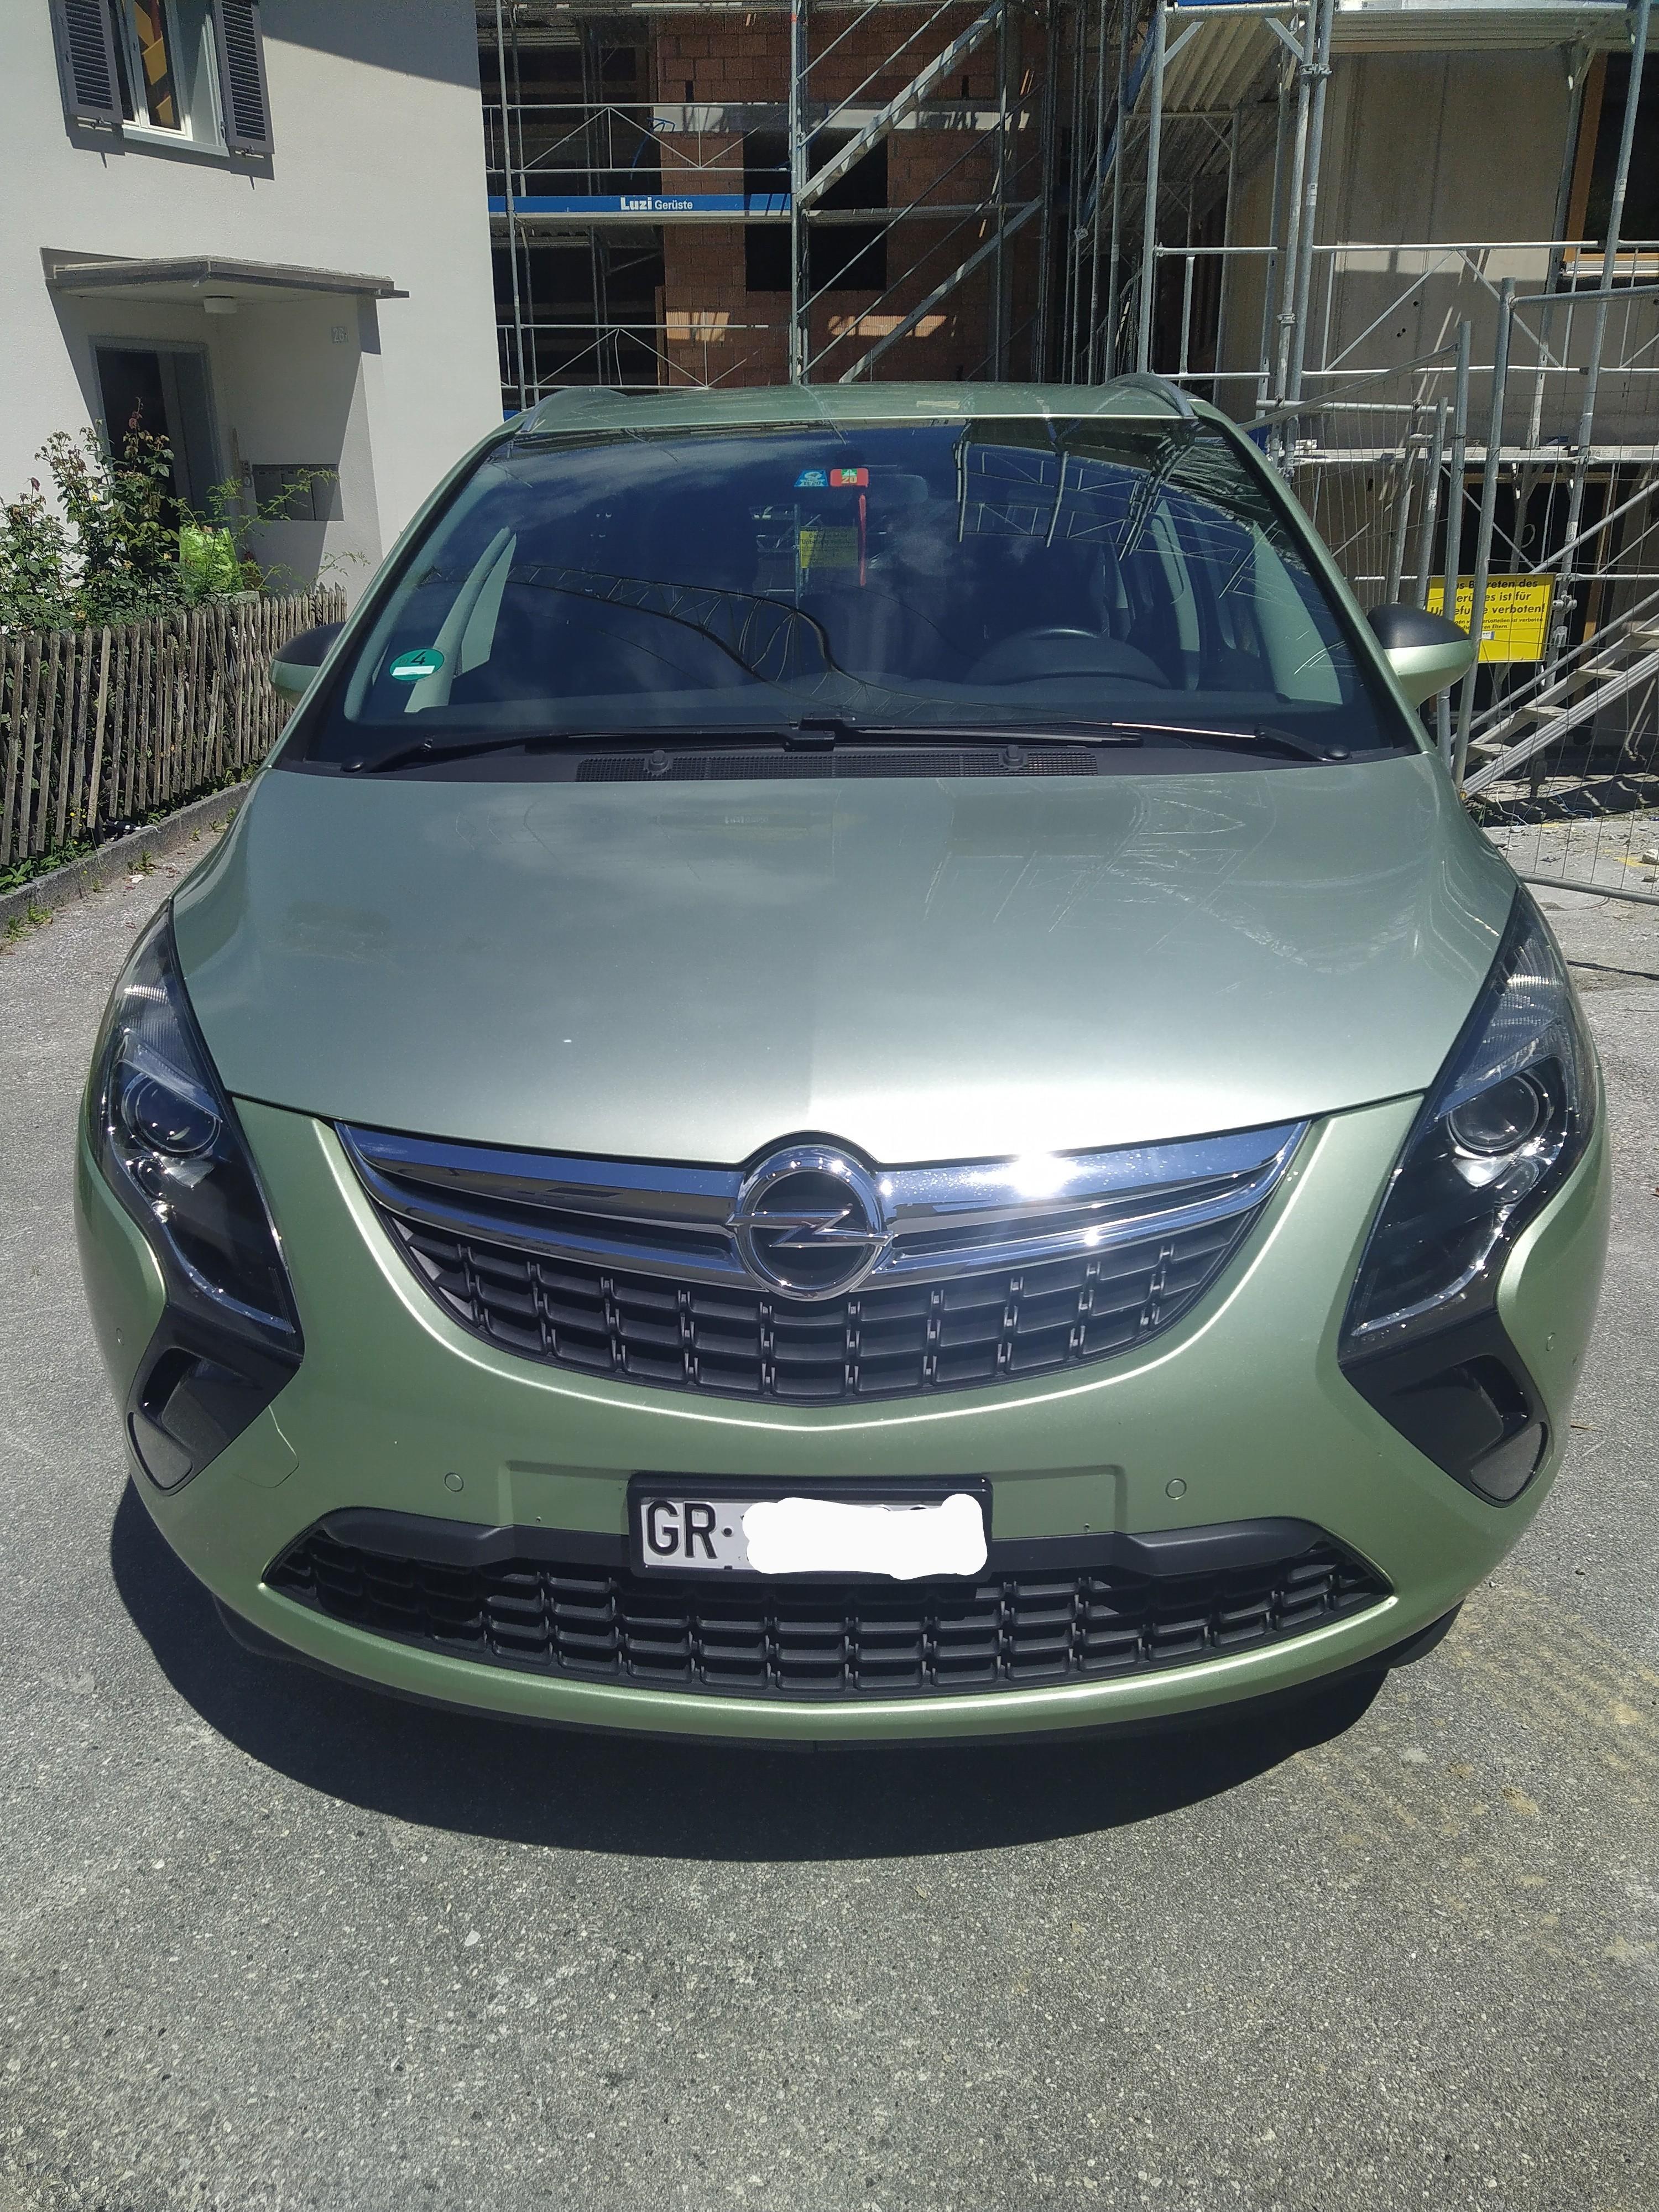 Opel Zafira Tourer 2.0 CDTI 110 167000 km für 6600 CHF